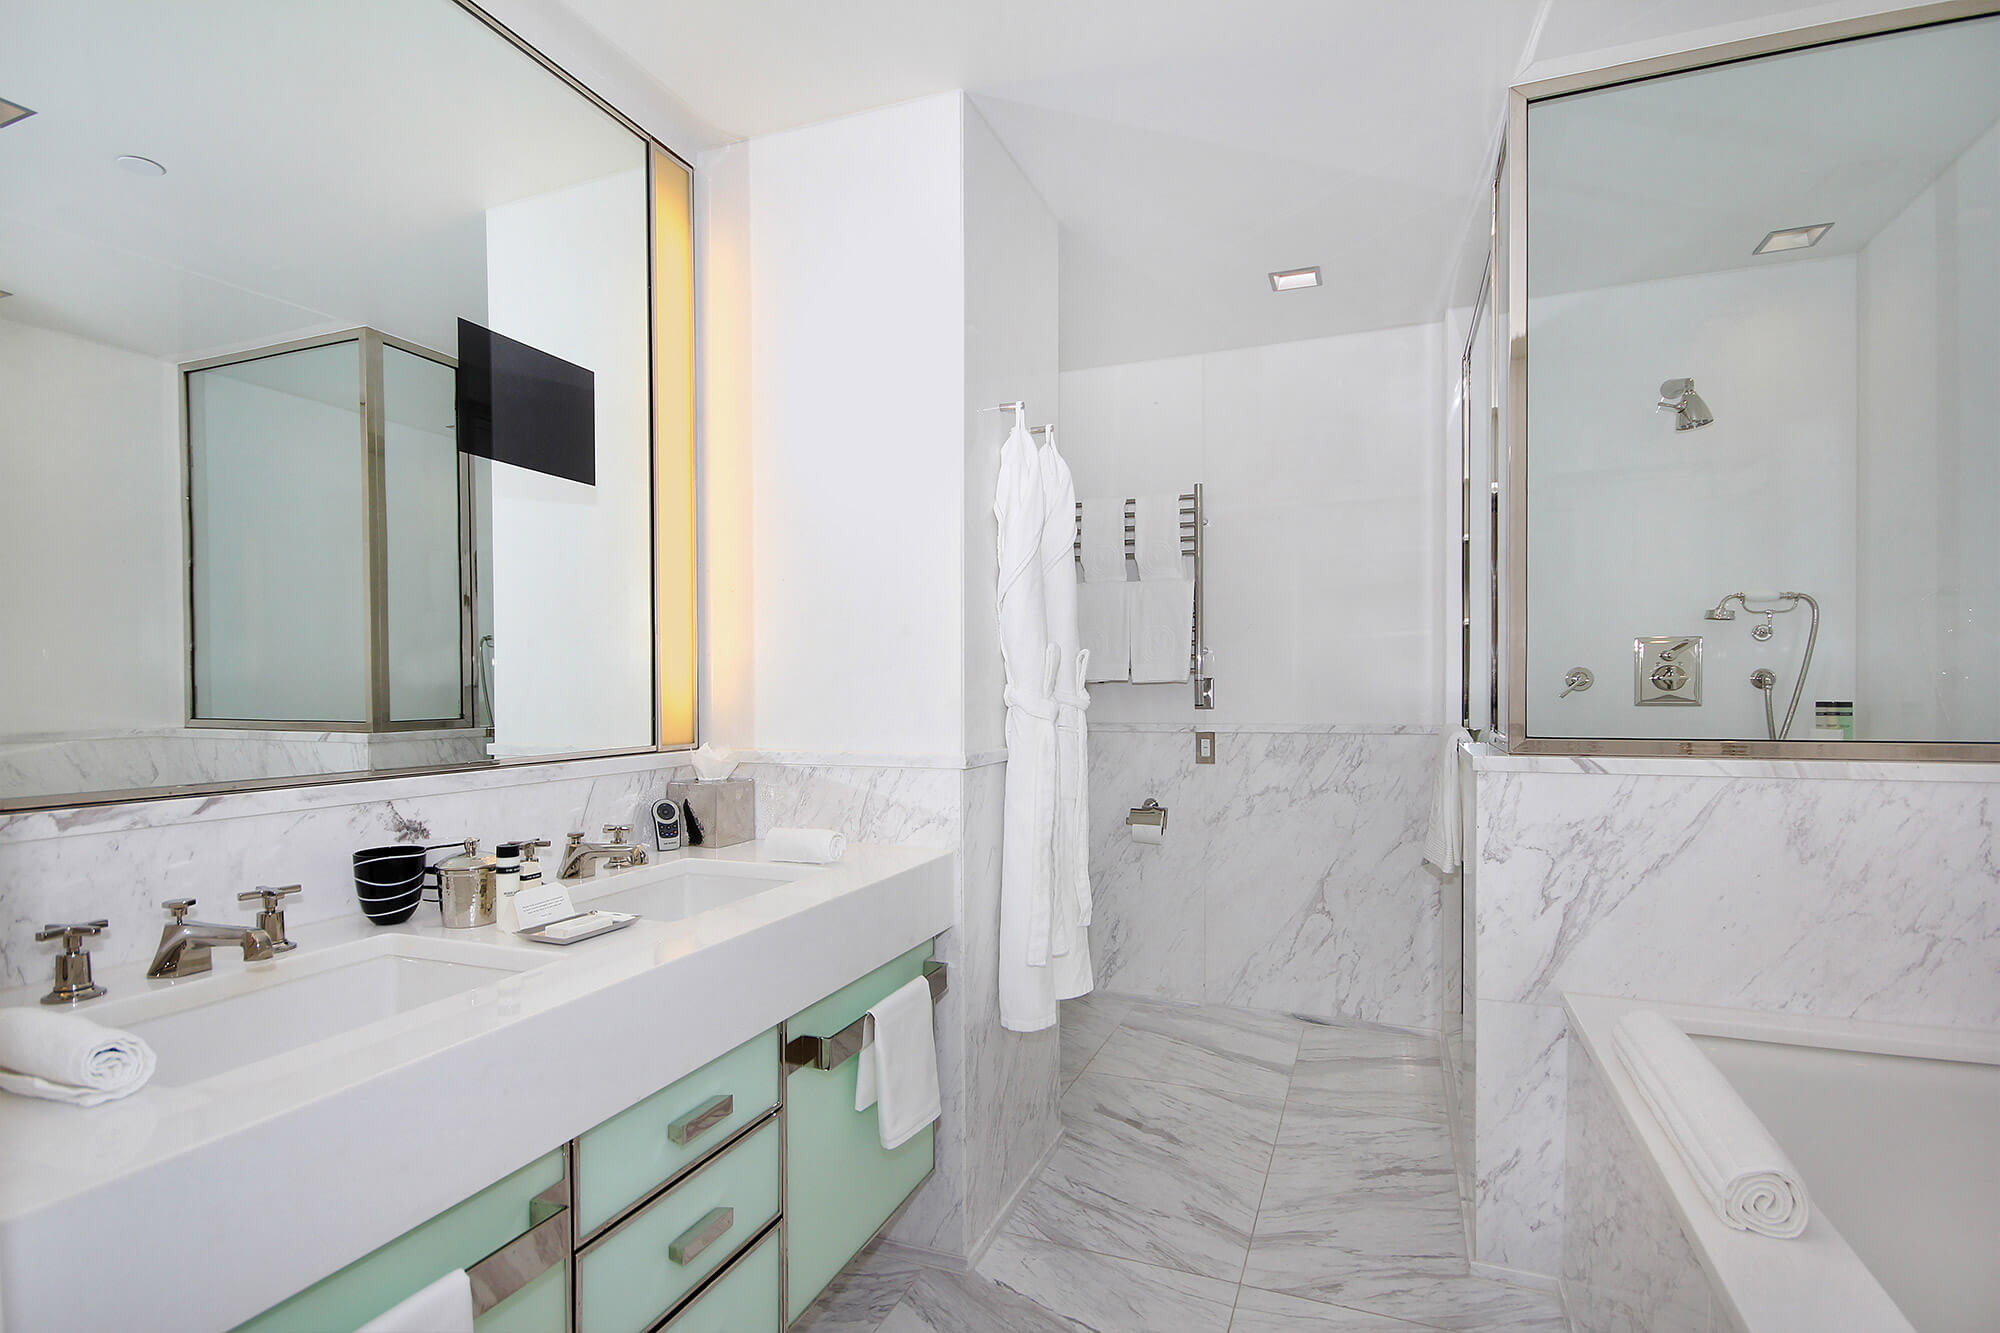 One Bedroom Suite New York Hotel Suites In New York The Mark Hotel The Madison Suites